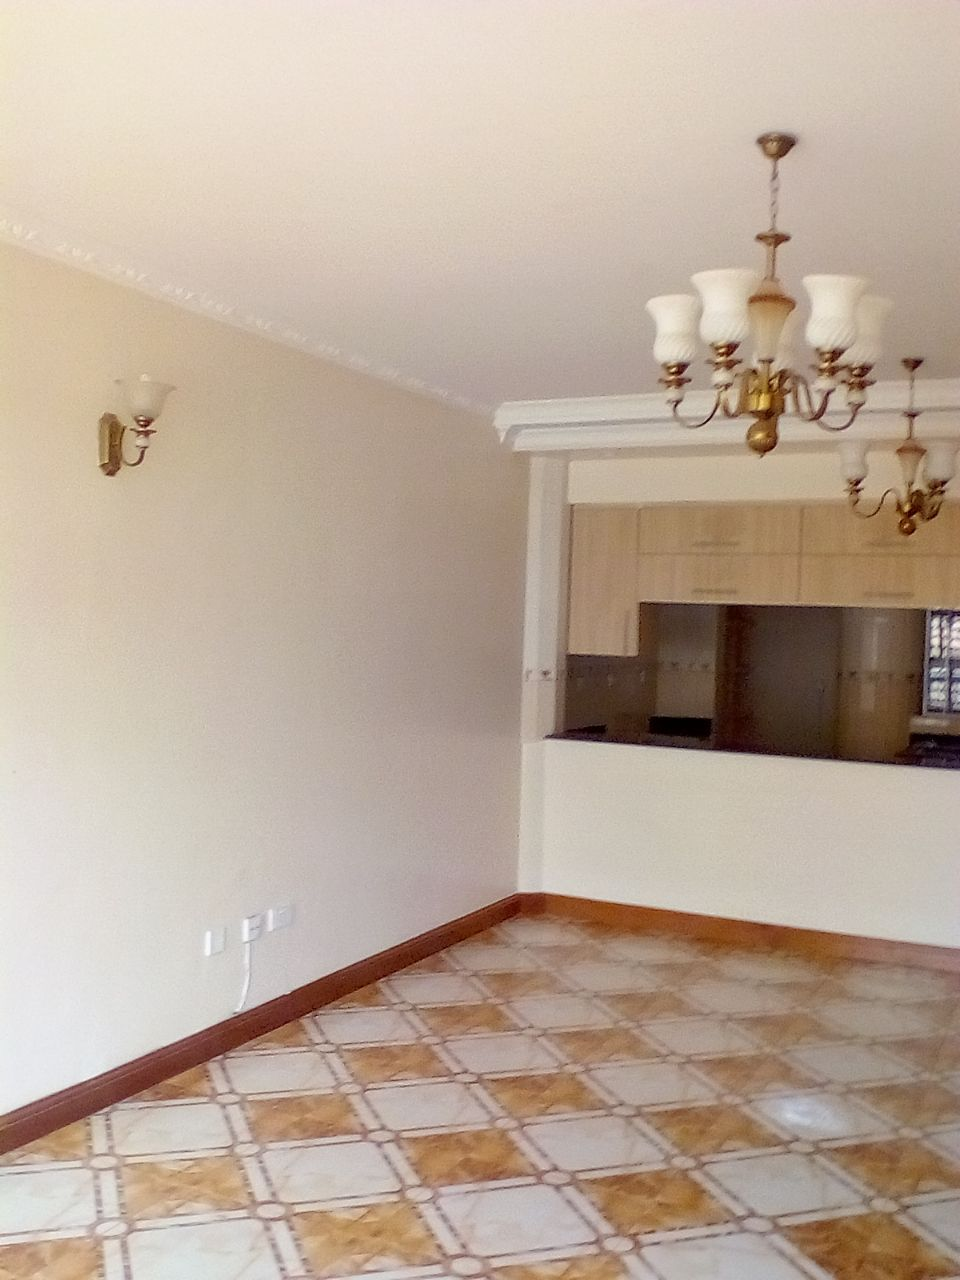 2 Bedrooms In Westlands, Nairobi (MD11256871) =24 hrs